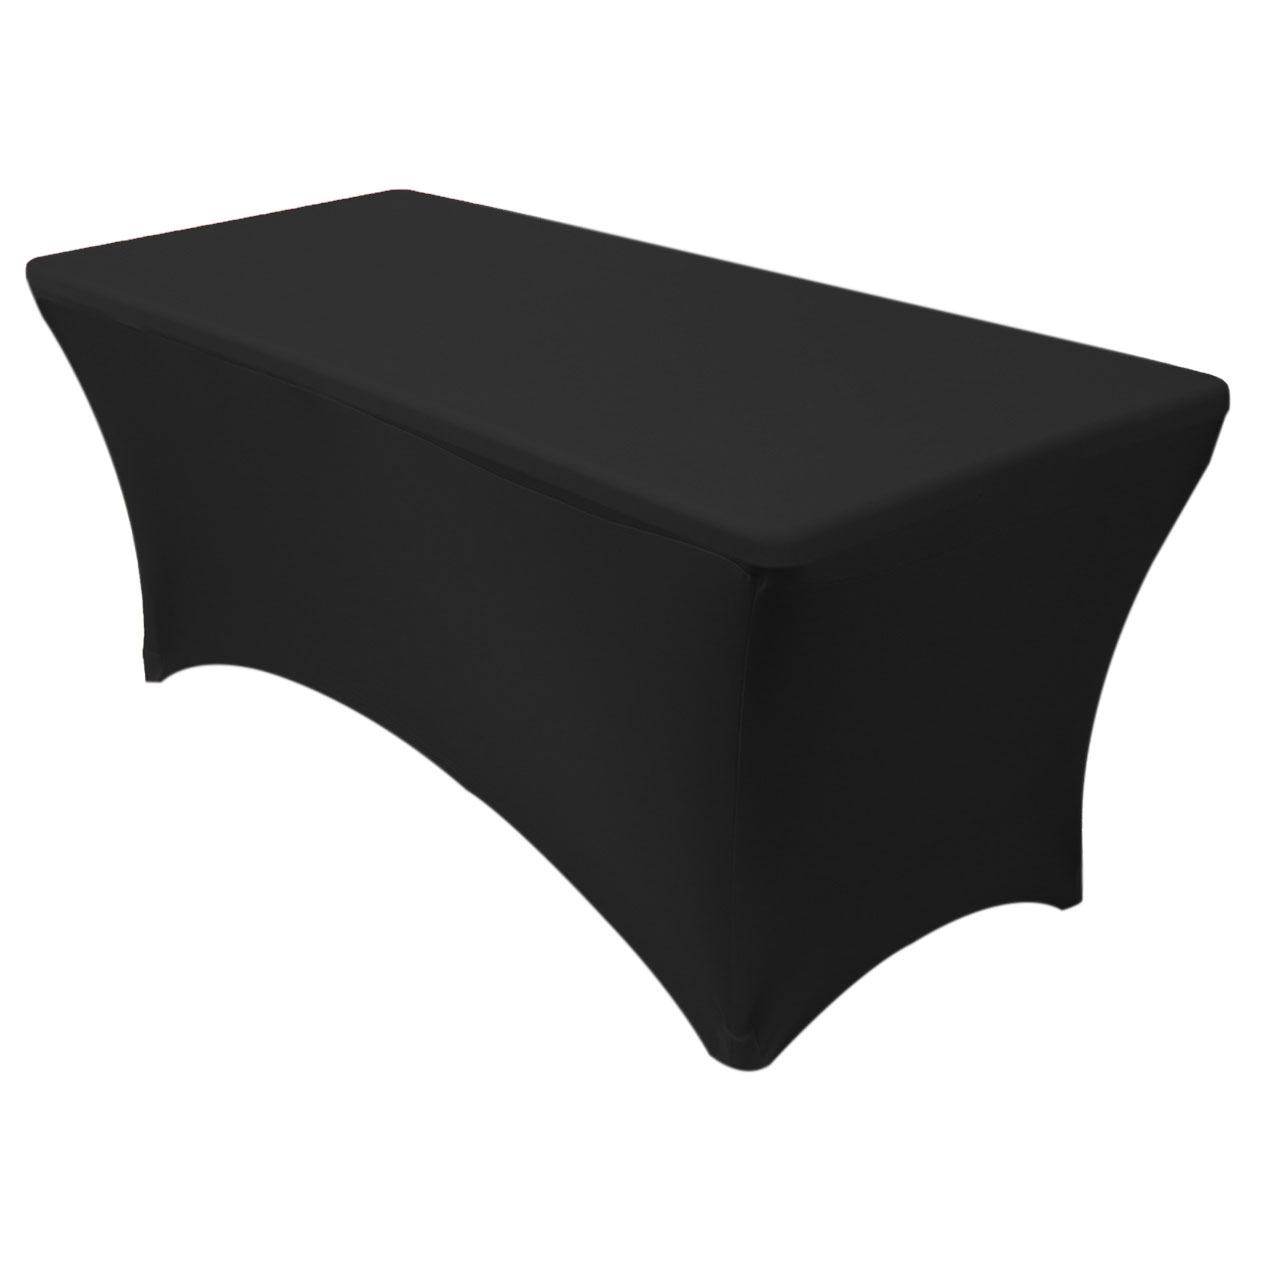 6ft Rectangular Spandex Tablecloth Black ...